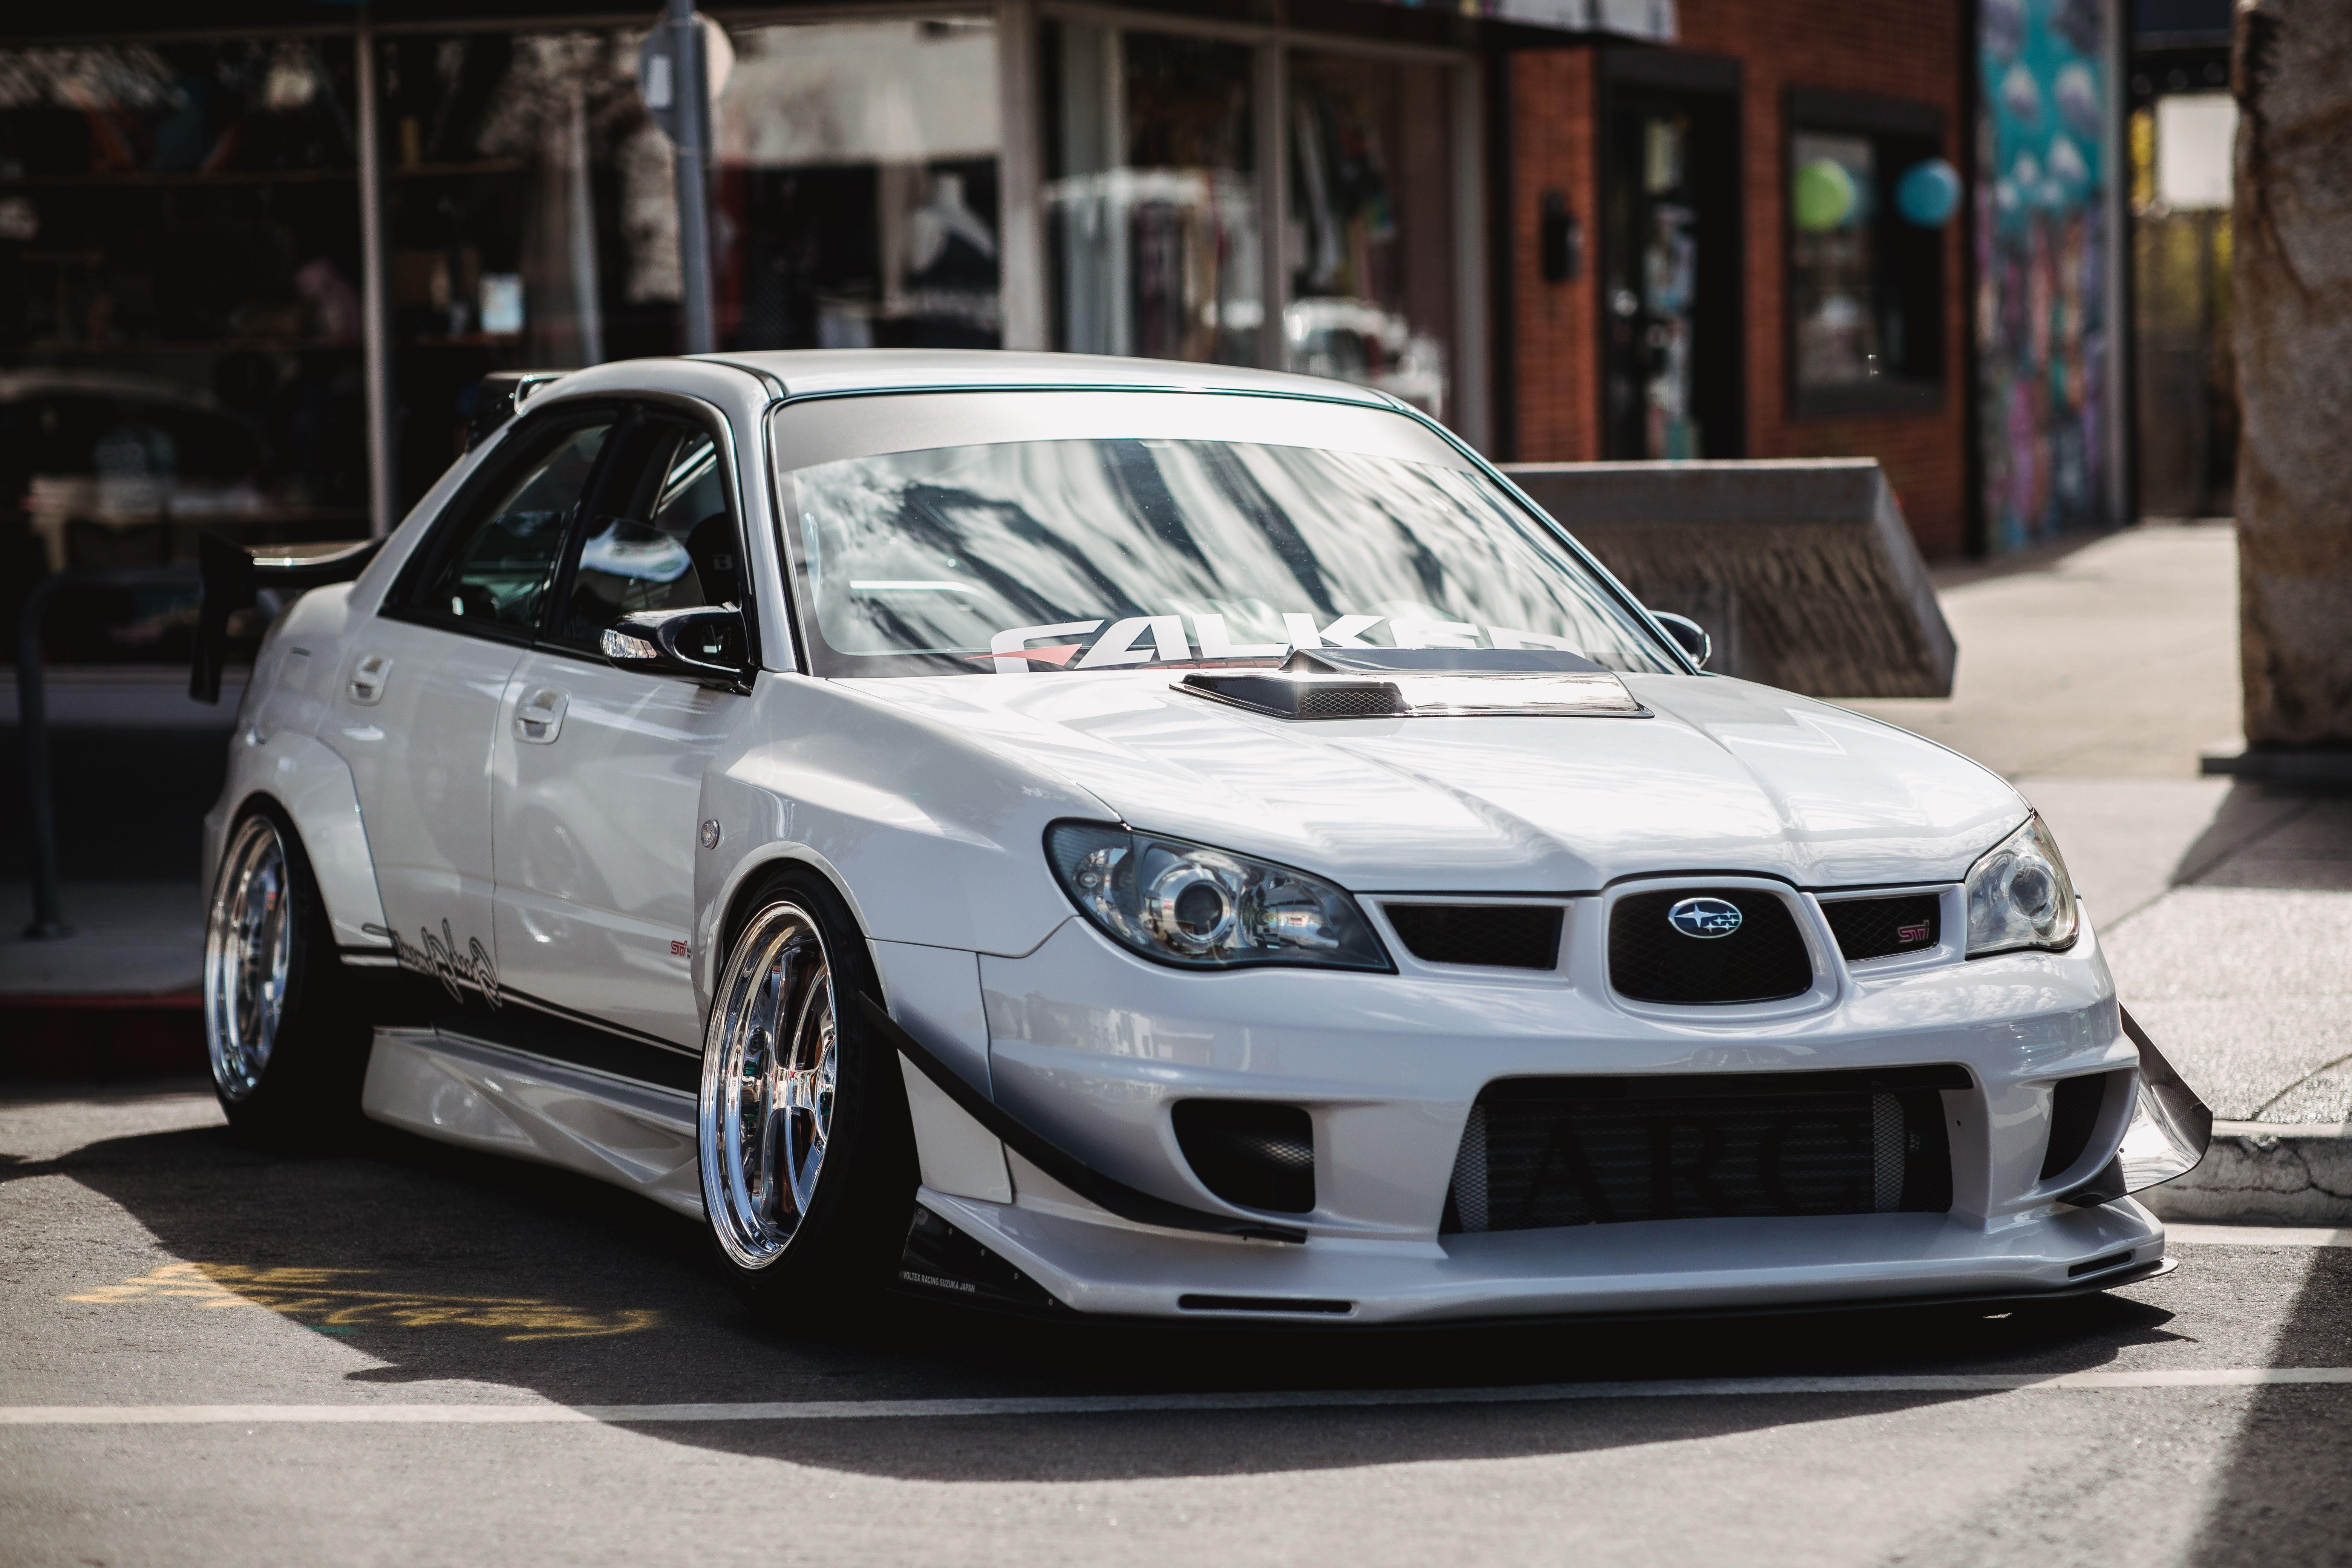 White Subaru Wrx Sedan Cars Subaru Wrx Sedan Cars Wrx